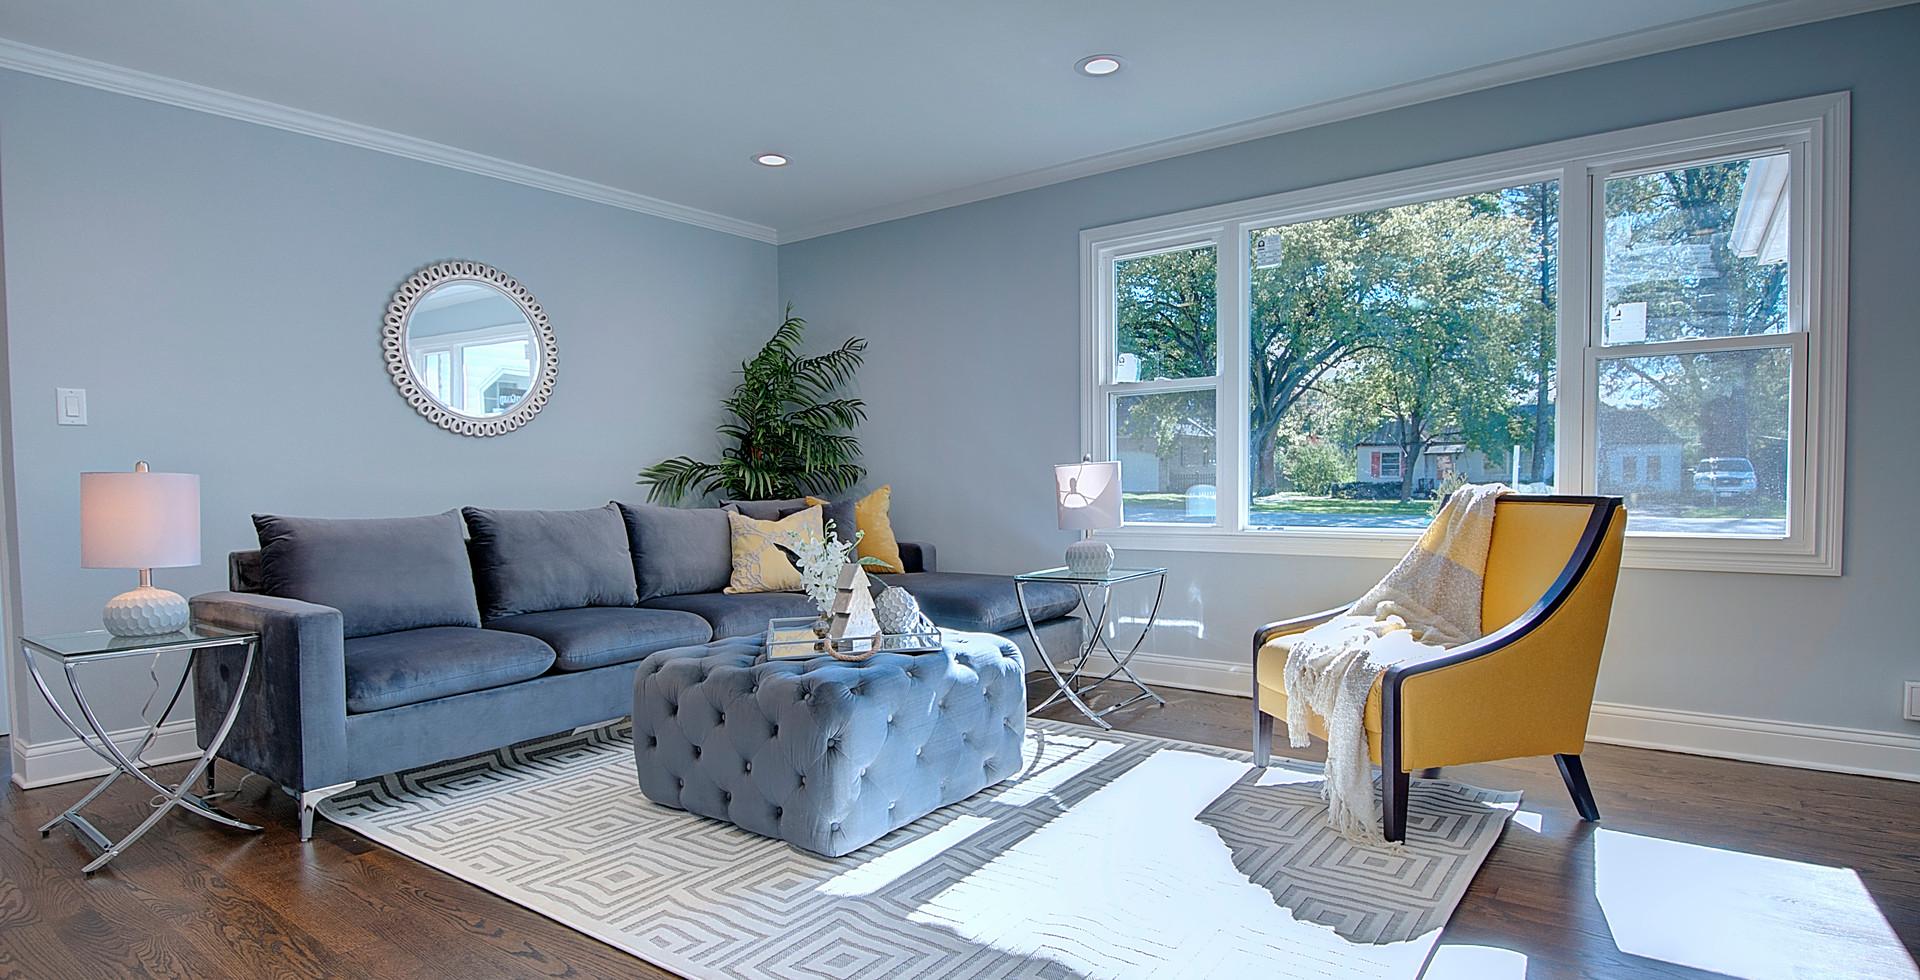 Living Room in Orland  designed by MRM Home Design.jpg